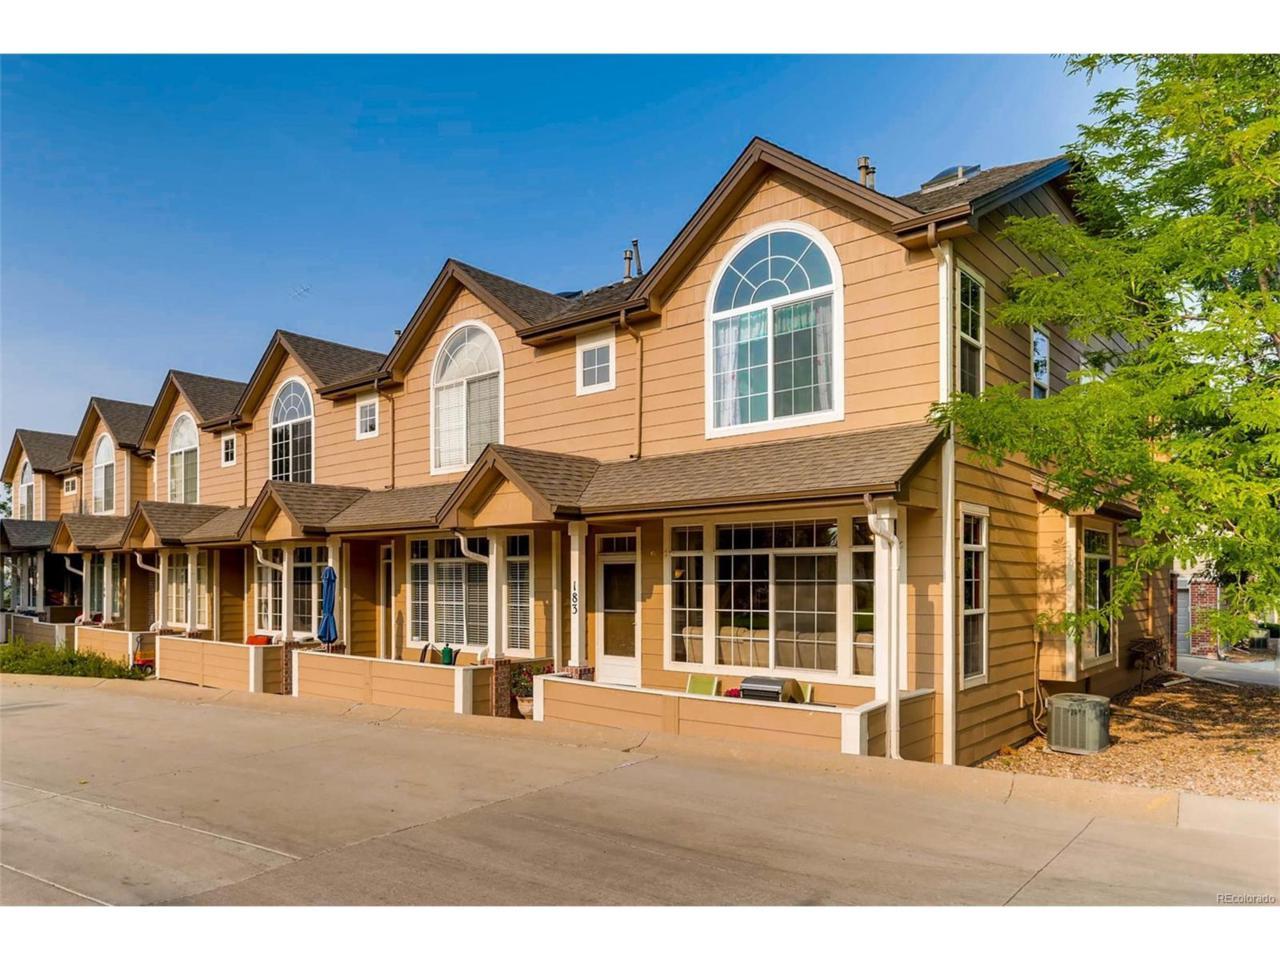 2855 Rock Creek Circle #183, Superior, CO 80027 (MLS #4747082) :: 8z Real Estate